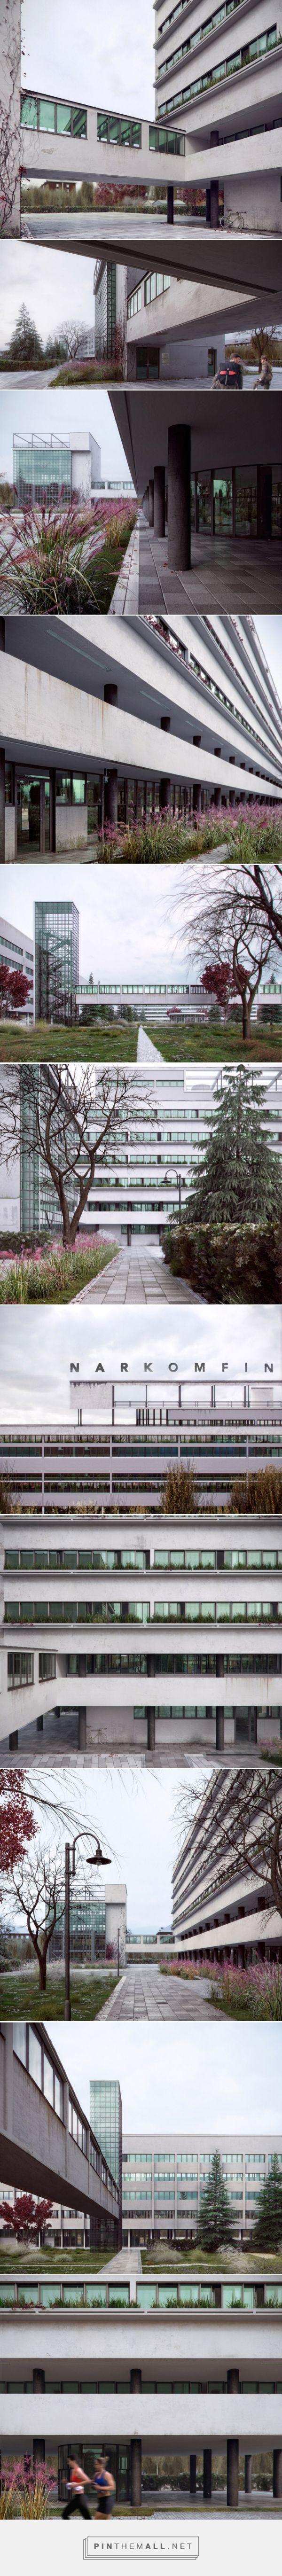 nikolaev rostislav imagines narkomfin 85 years later - created via http://pinthemall.net